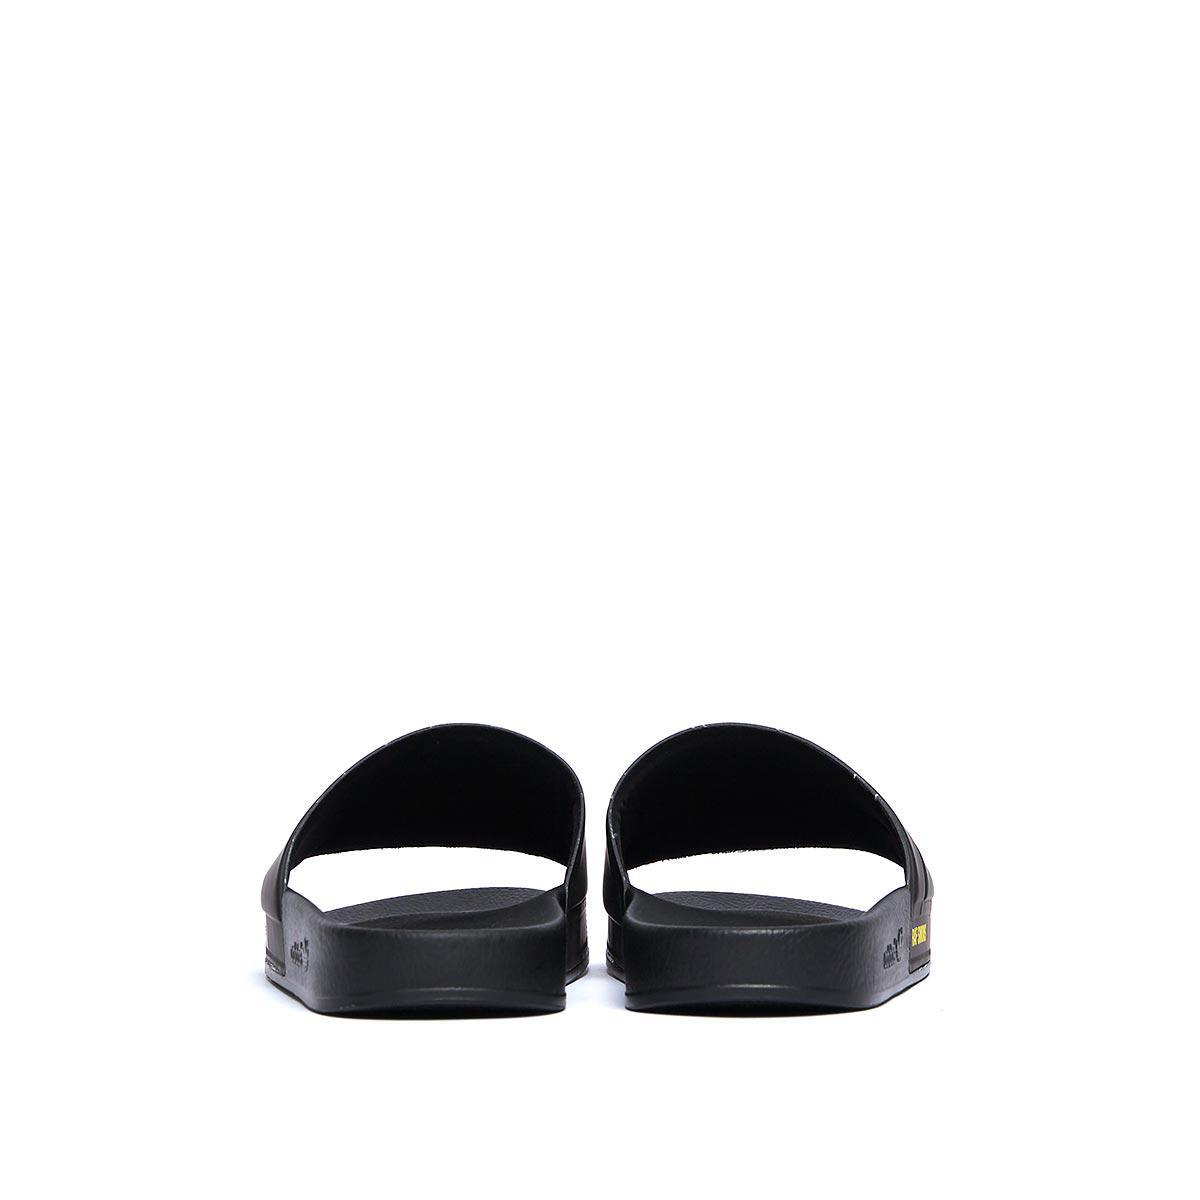 fa1804a266144c Lyst - adidas By Raf Simons Bunny Adilette Rubber Slides in Black ...